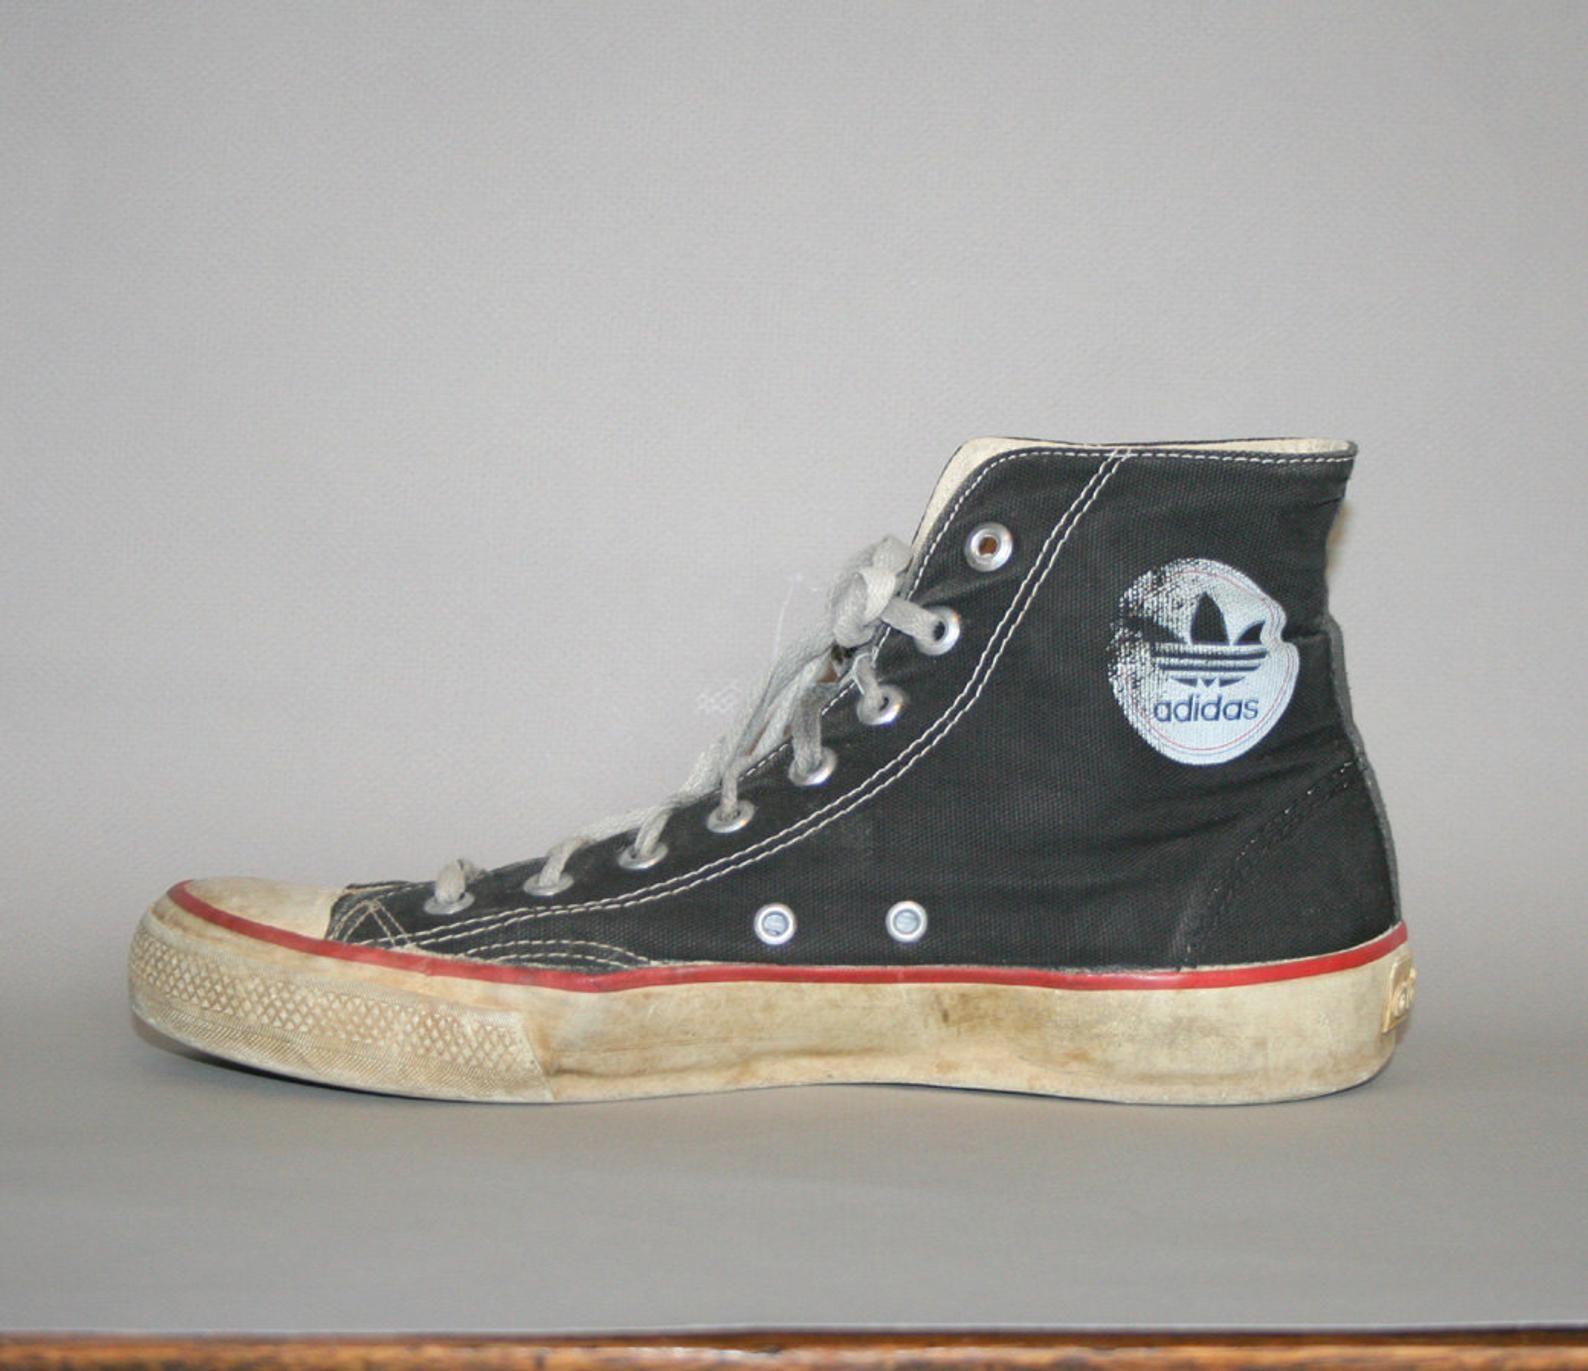 influenza Dinamarca fuego  80s ADIDAS SNEAKERS / Rare Chuck Taylor Style Hi-Tops 11 | Etsy | Adidas  sneakers women, Adidas sneakers, Shoes sneakers adidas